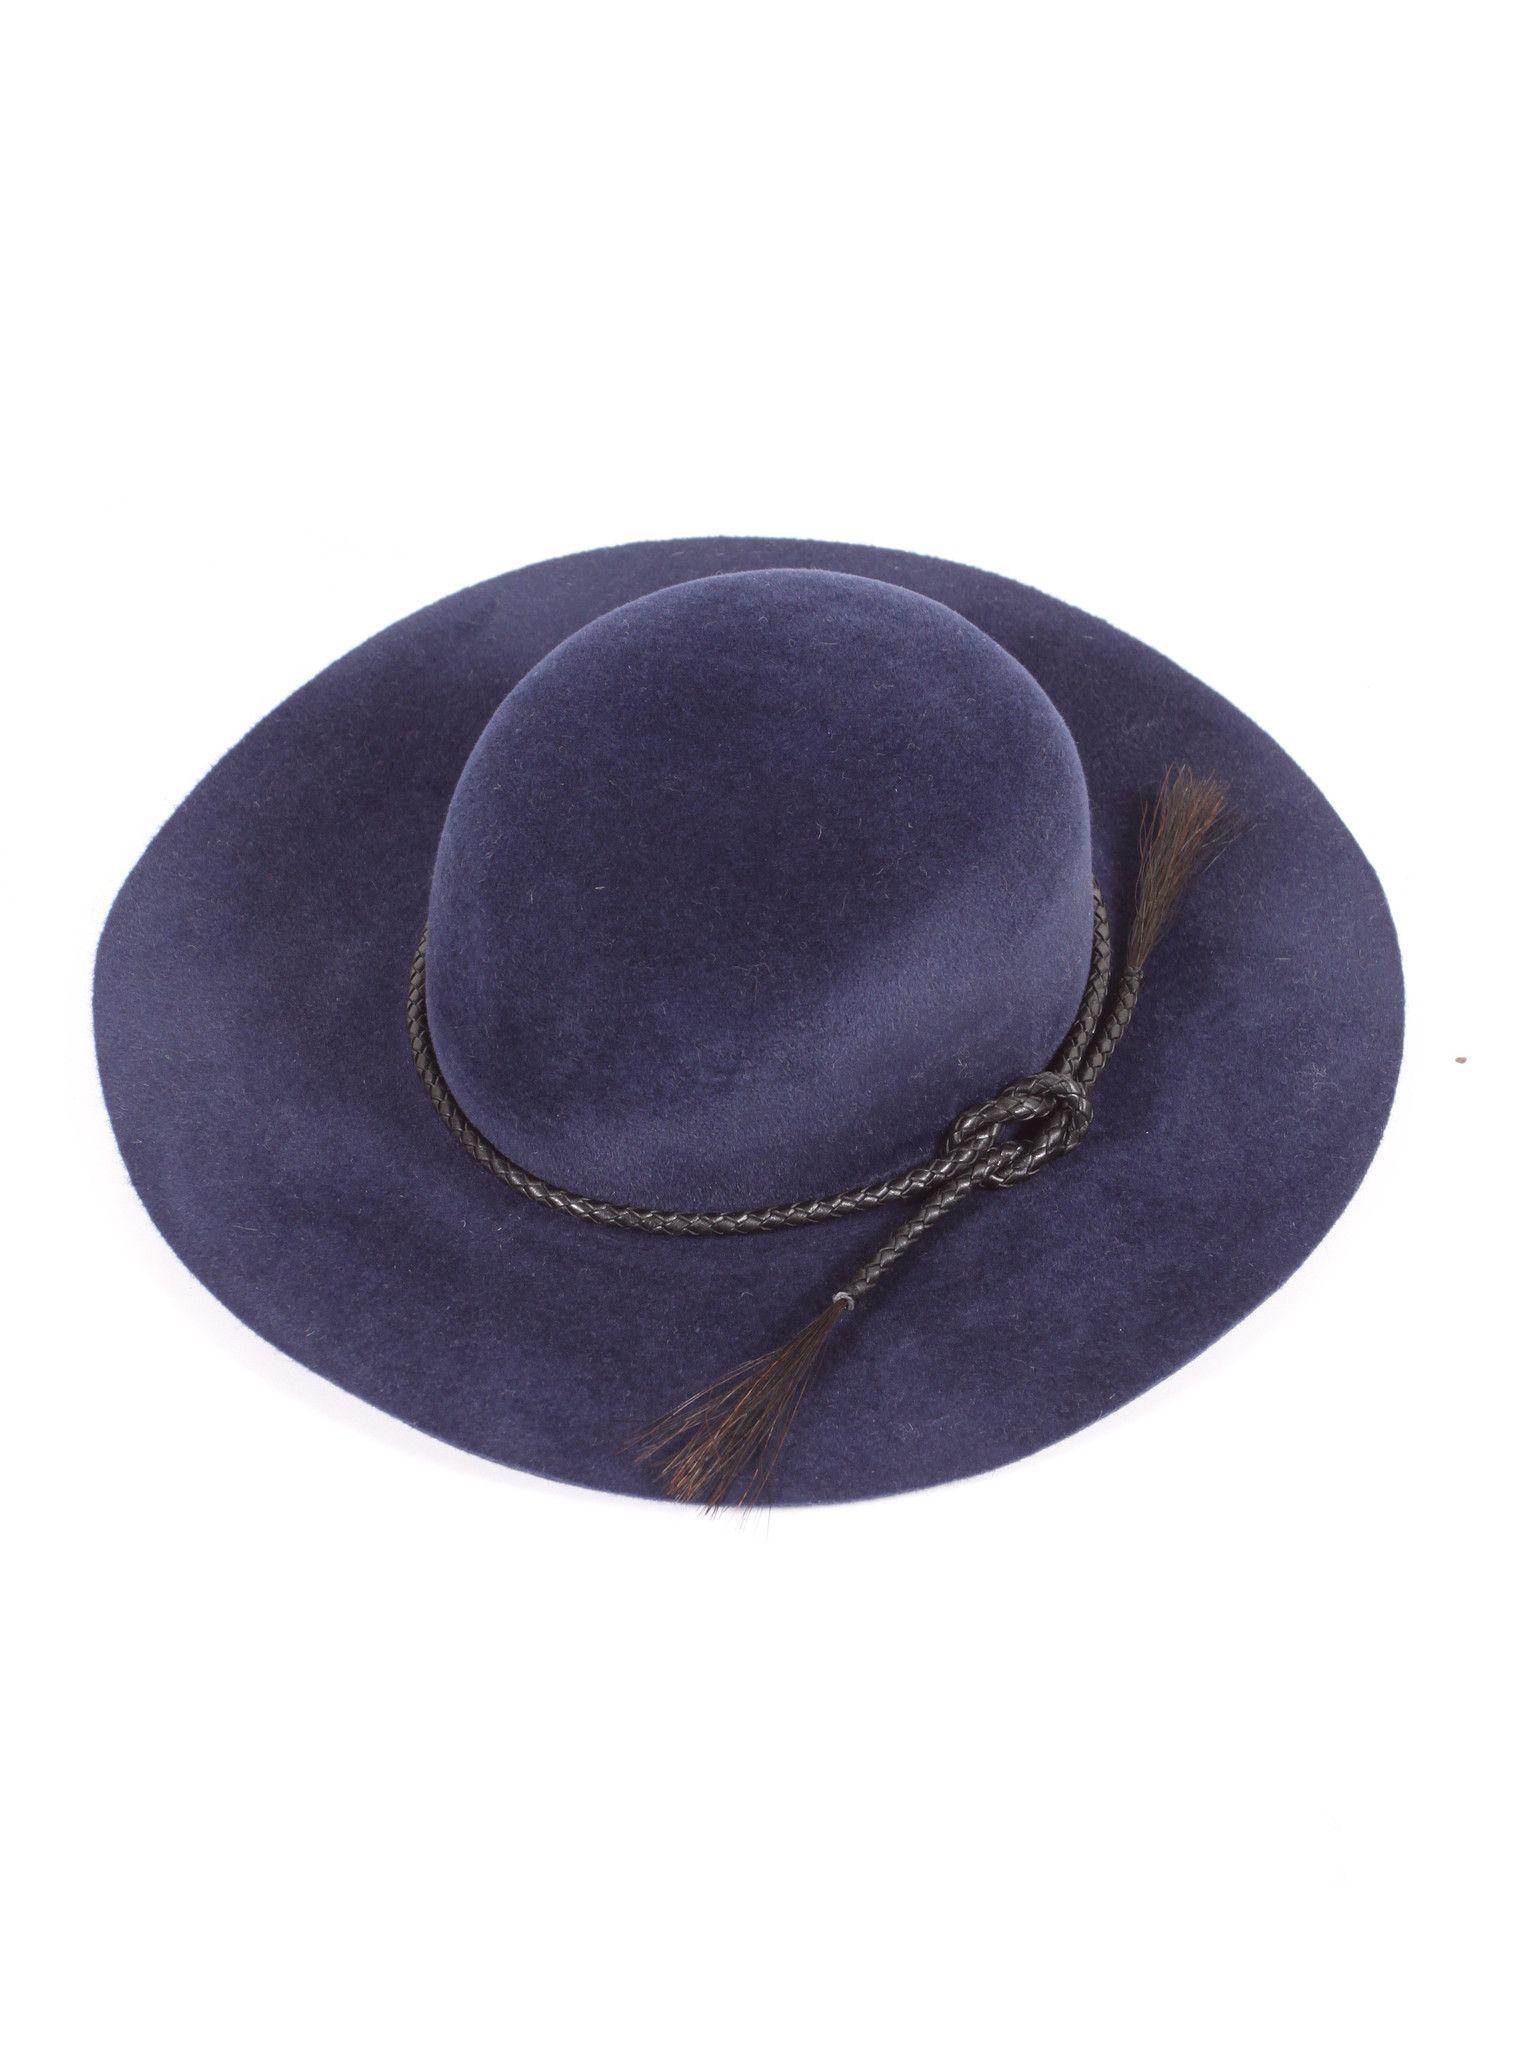 36f56e8ac47 Ryan Roche Angora Wool Hat with Leather Band - Indigo Badass